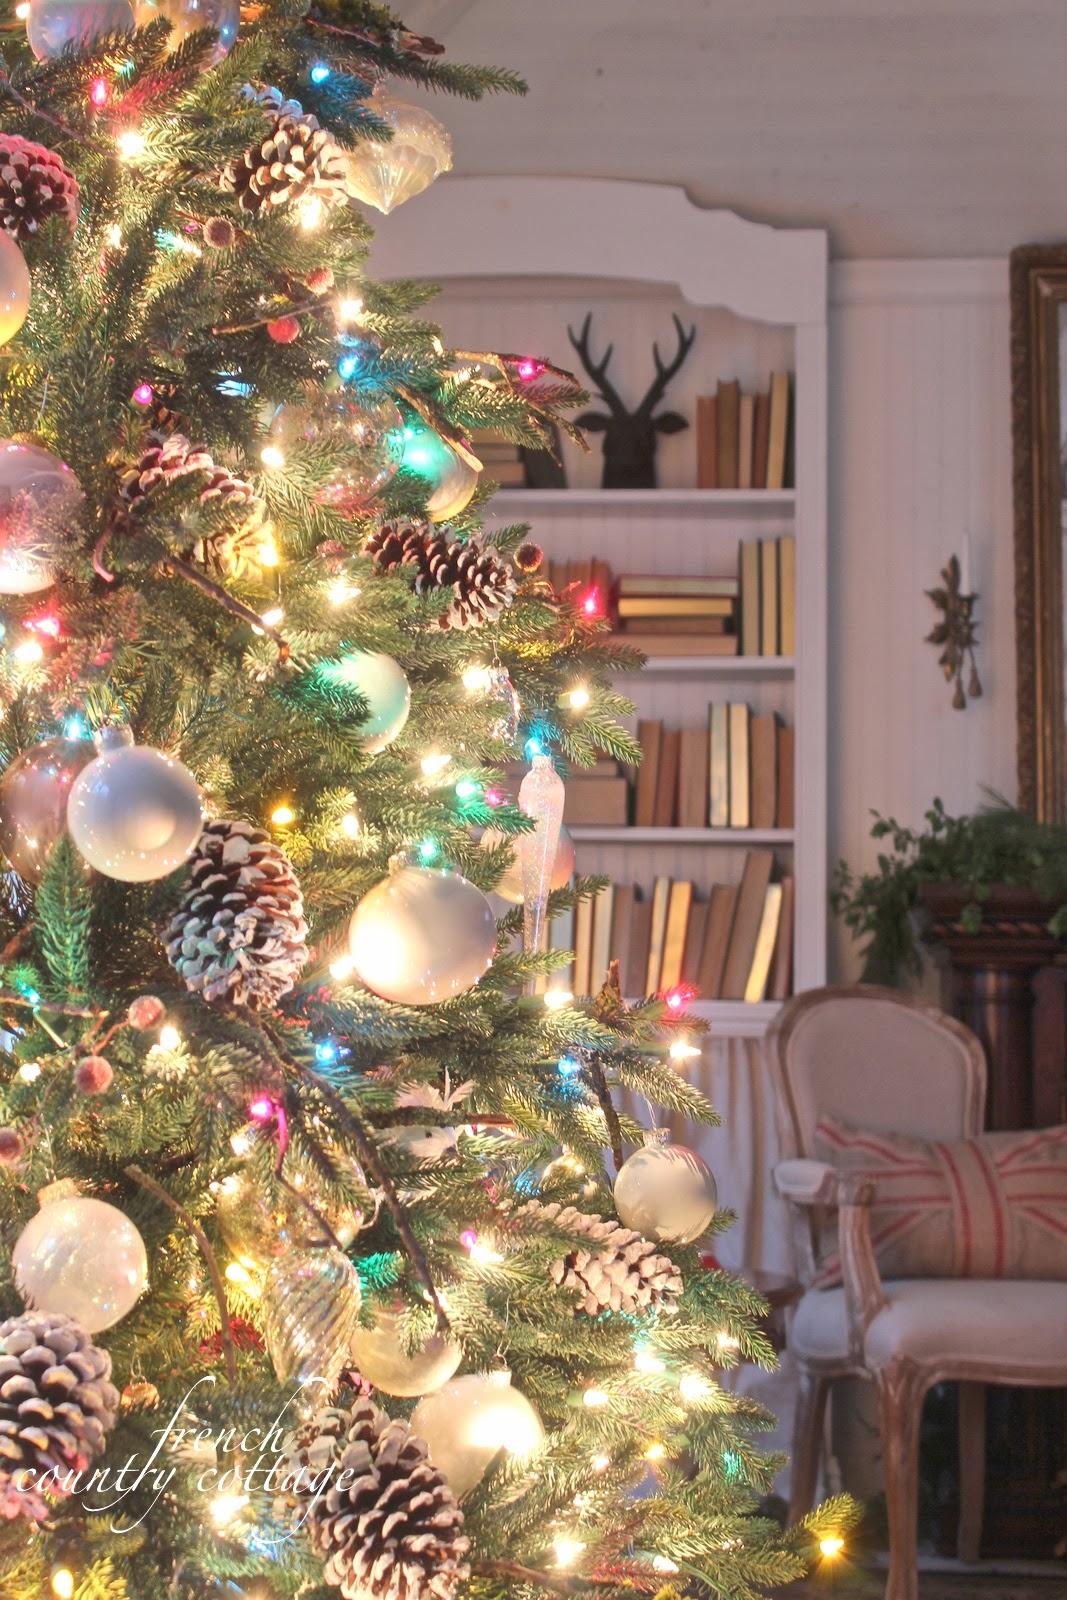 Lifelike Christmas Trees